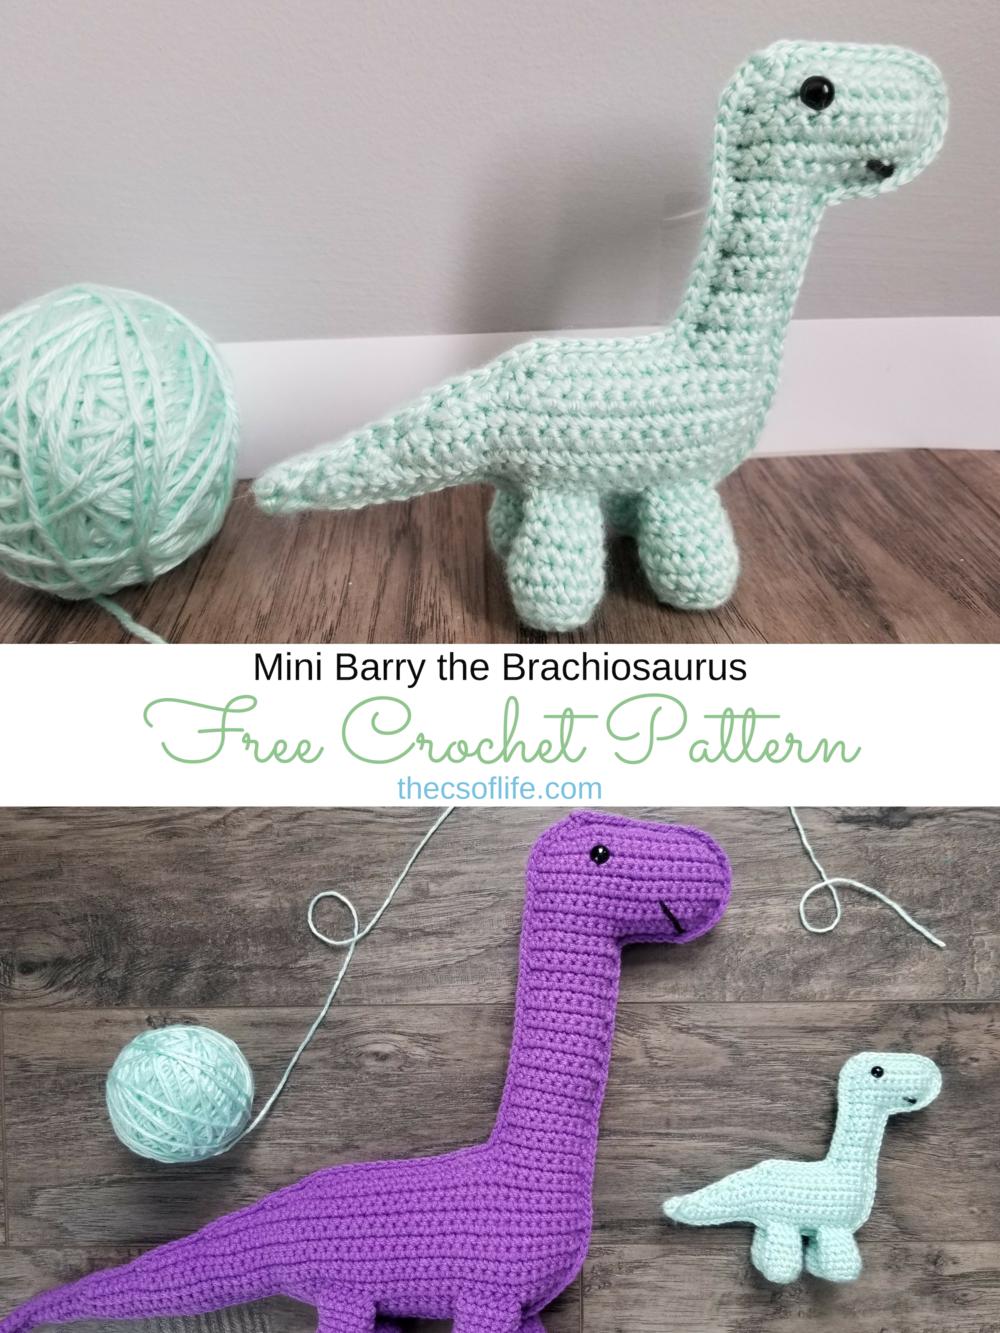 Mini Barry the Brachiosaurus - Free Crochet Pattern